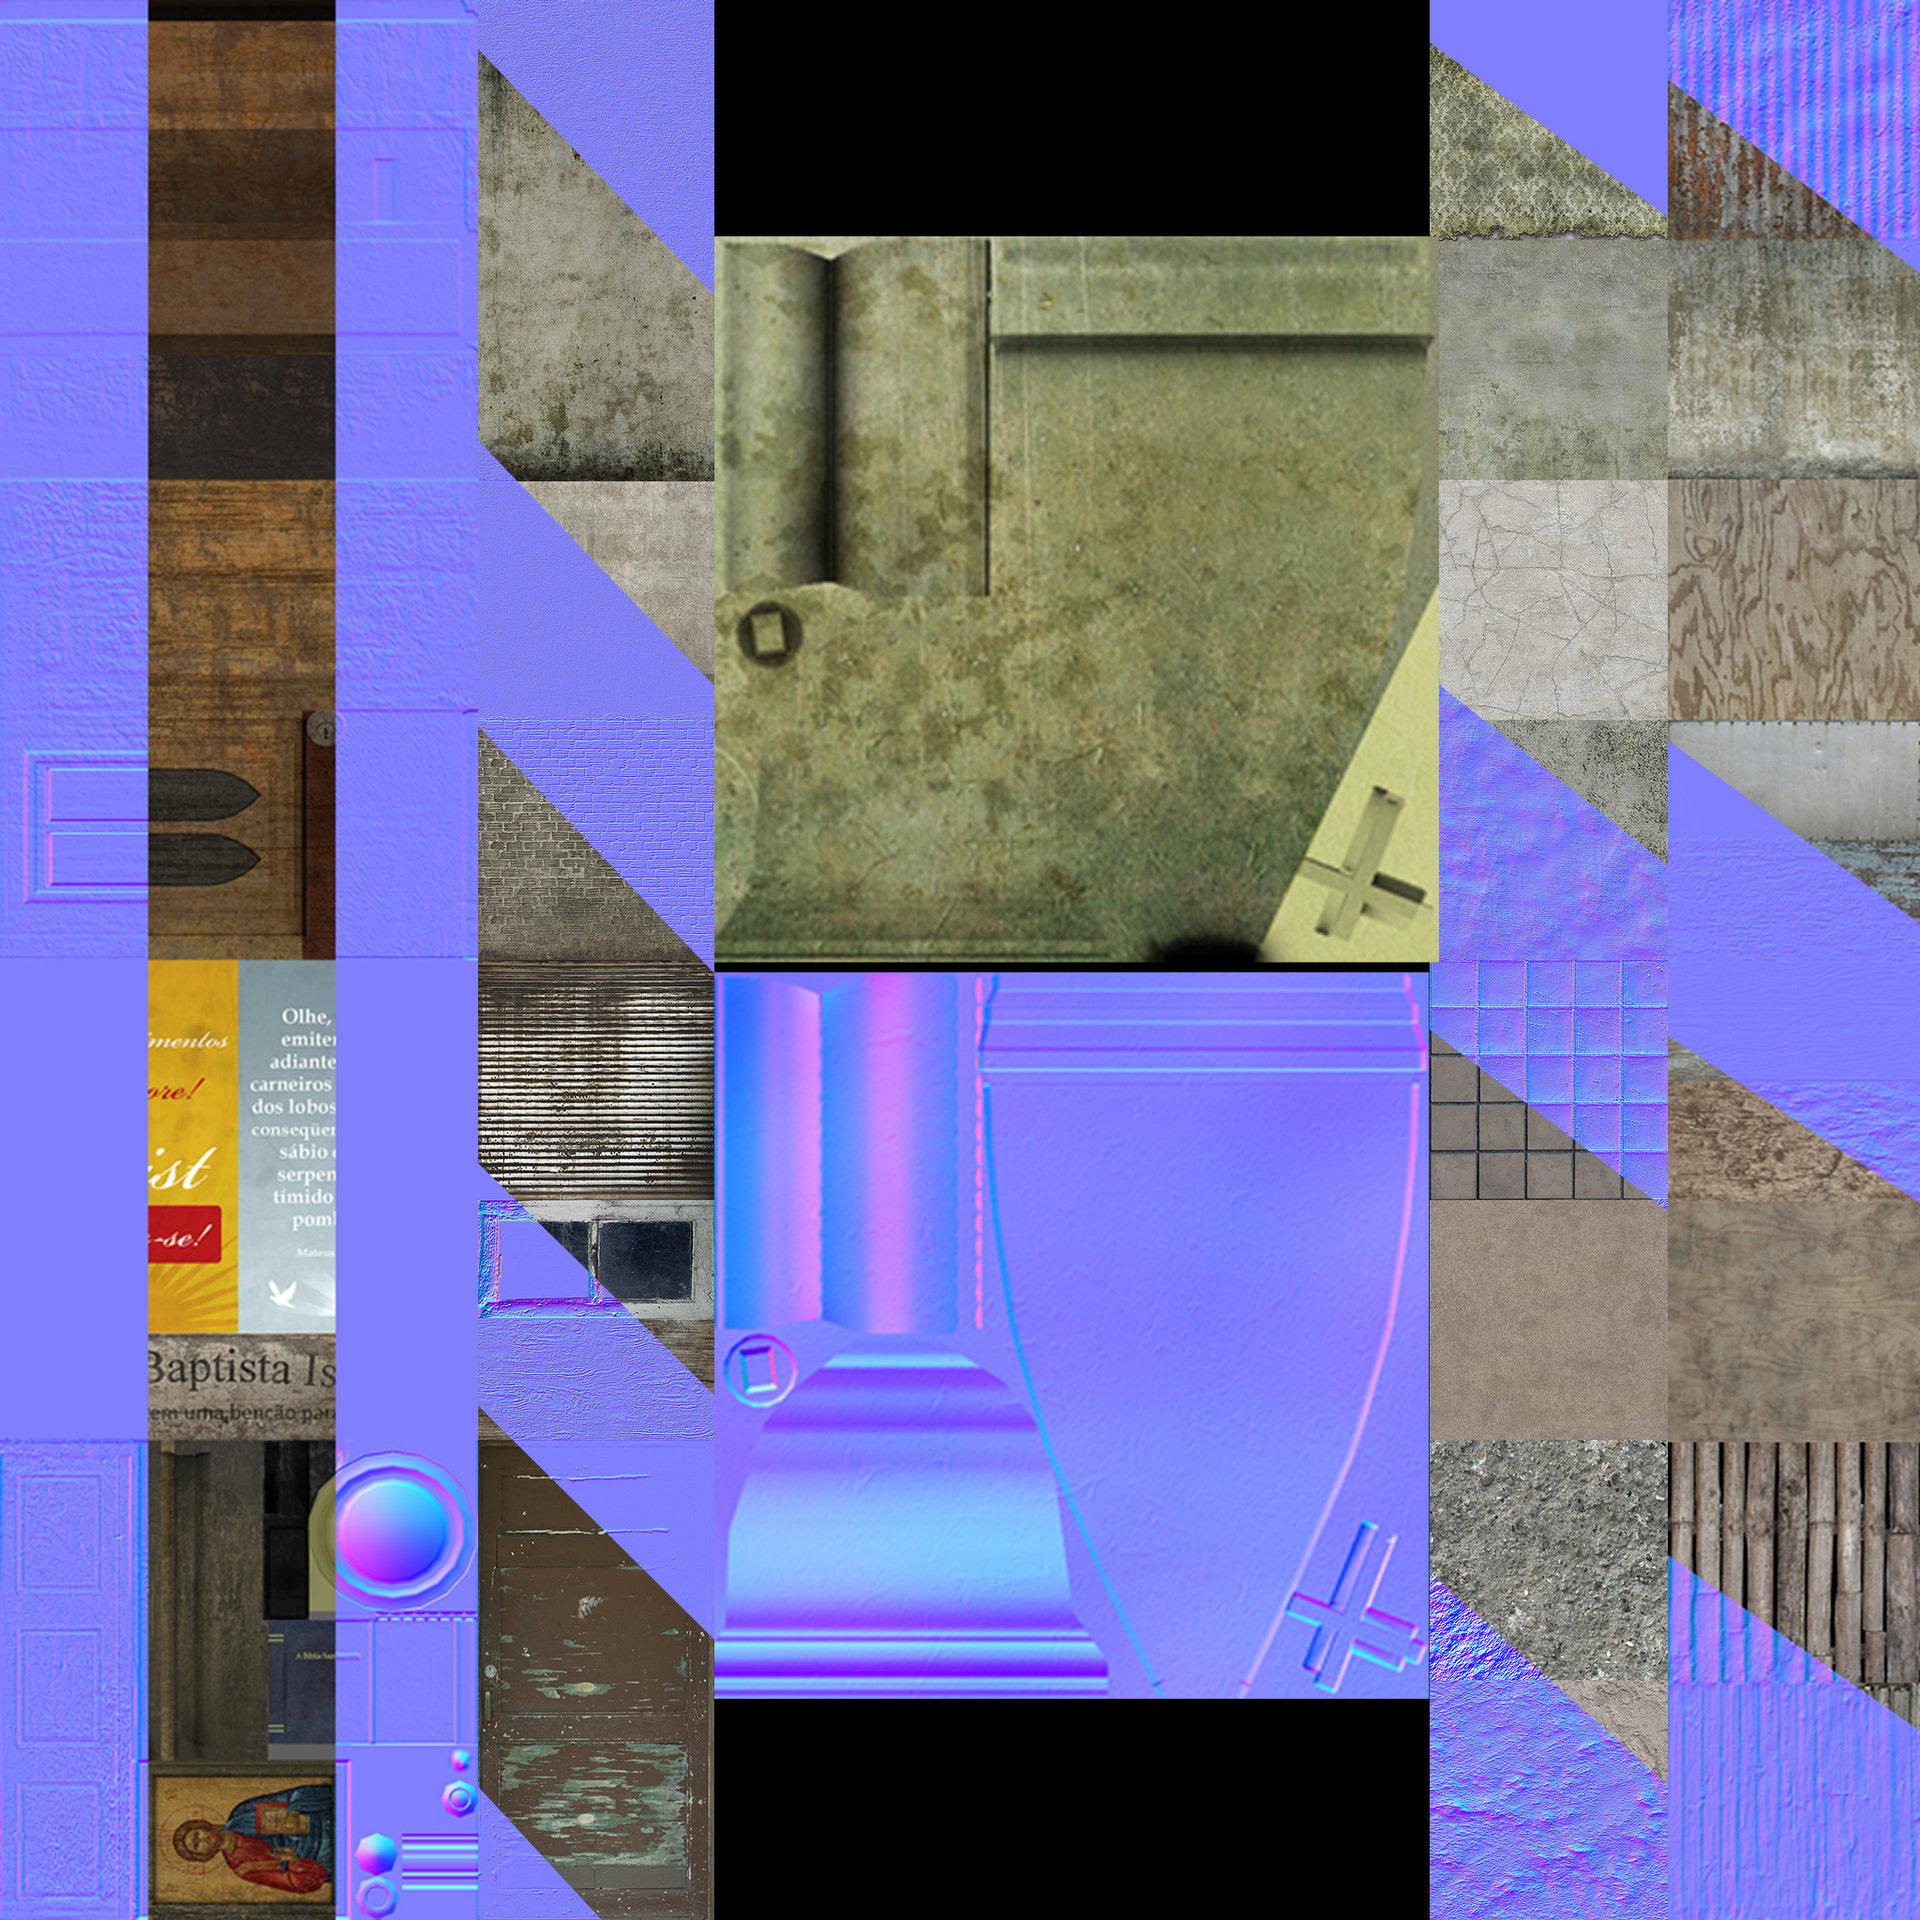 Frank pusateri arch layout sheet